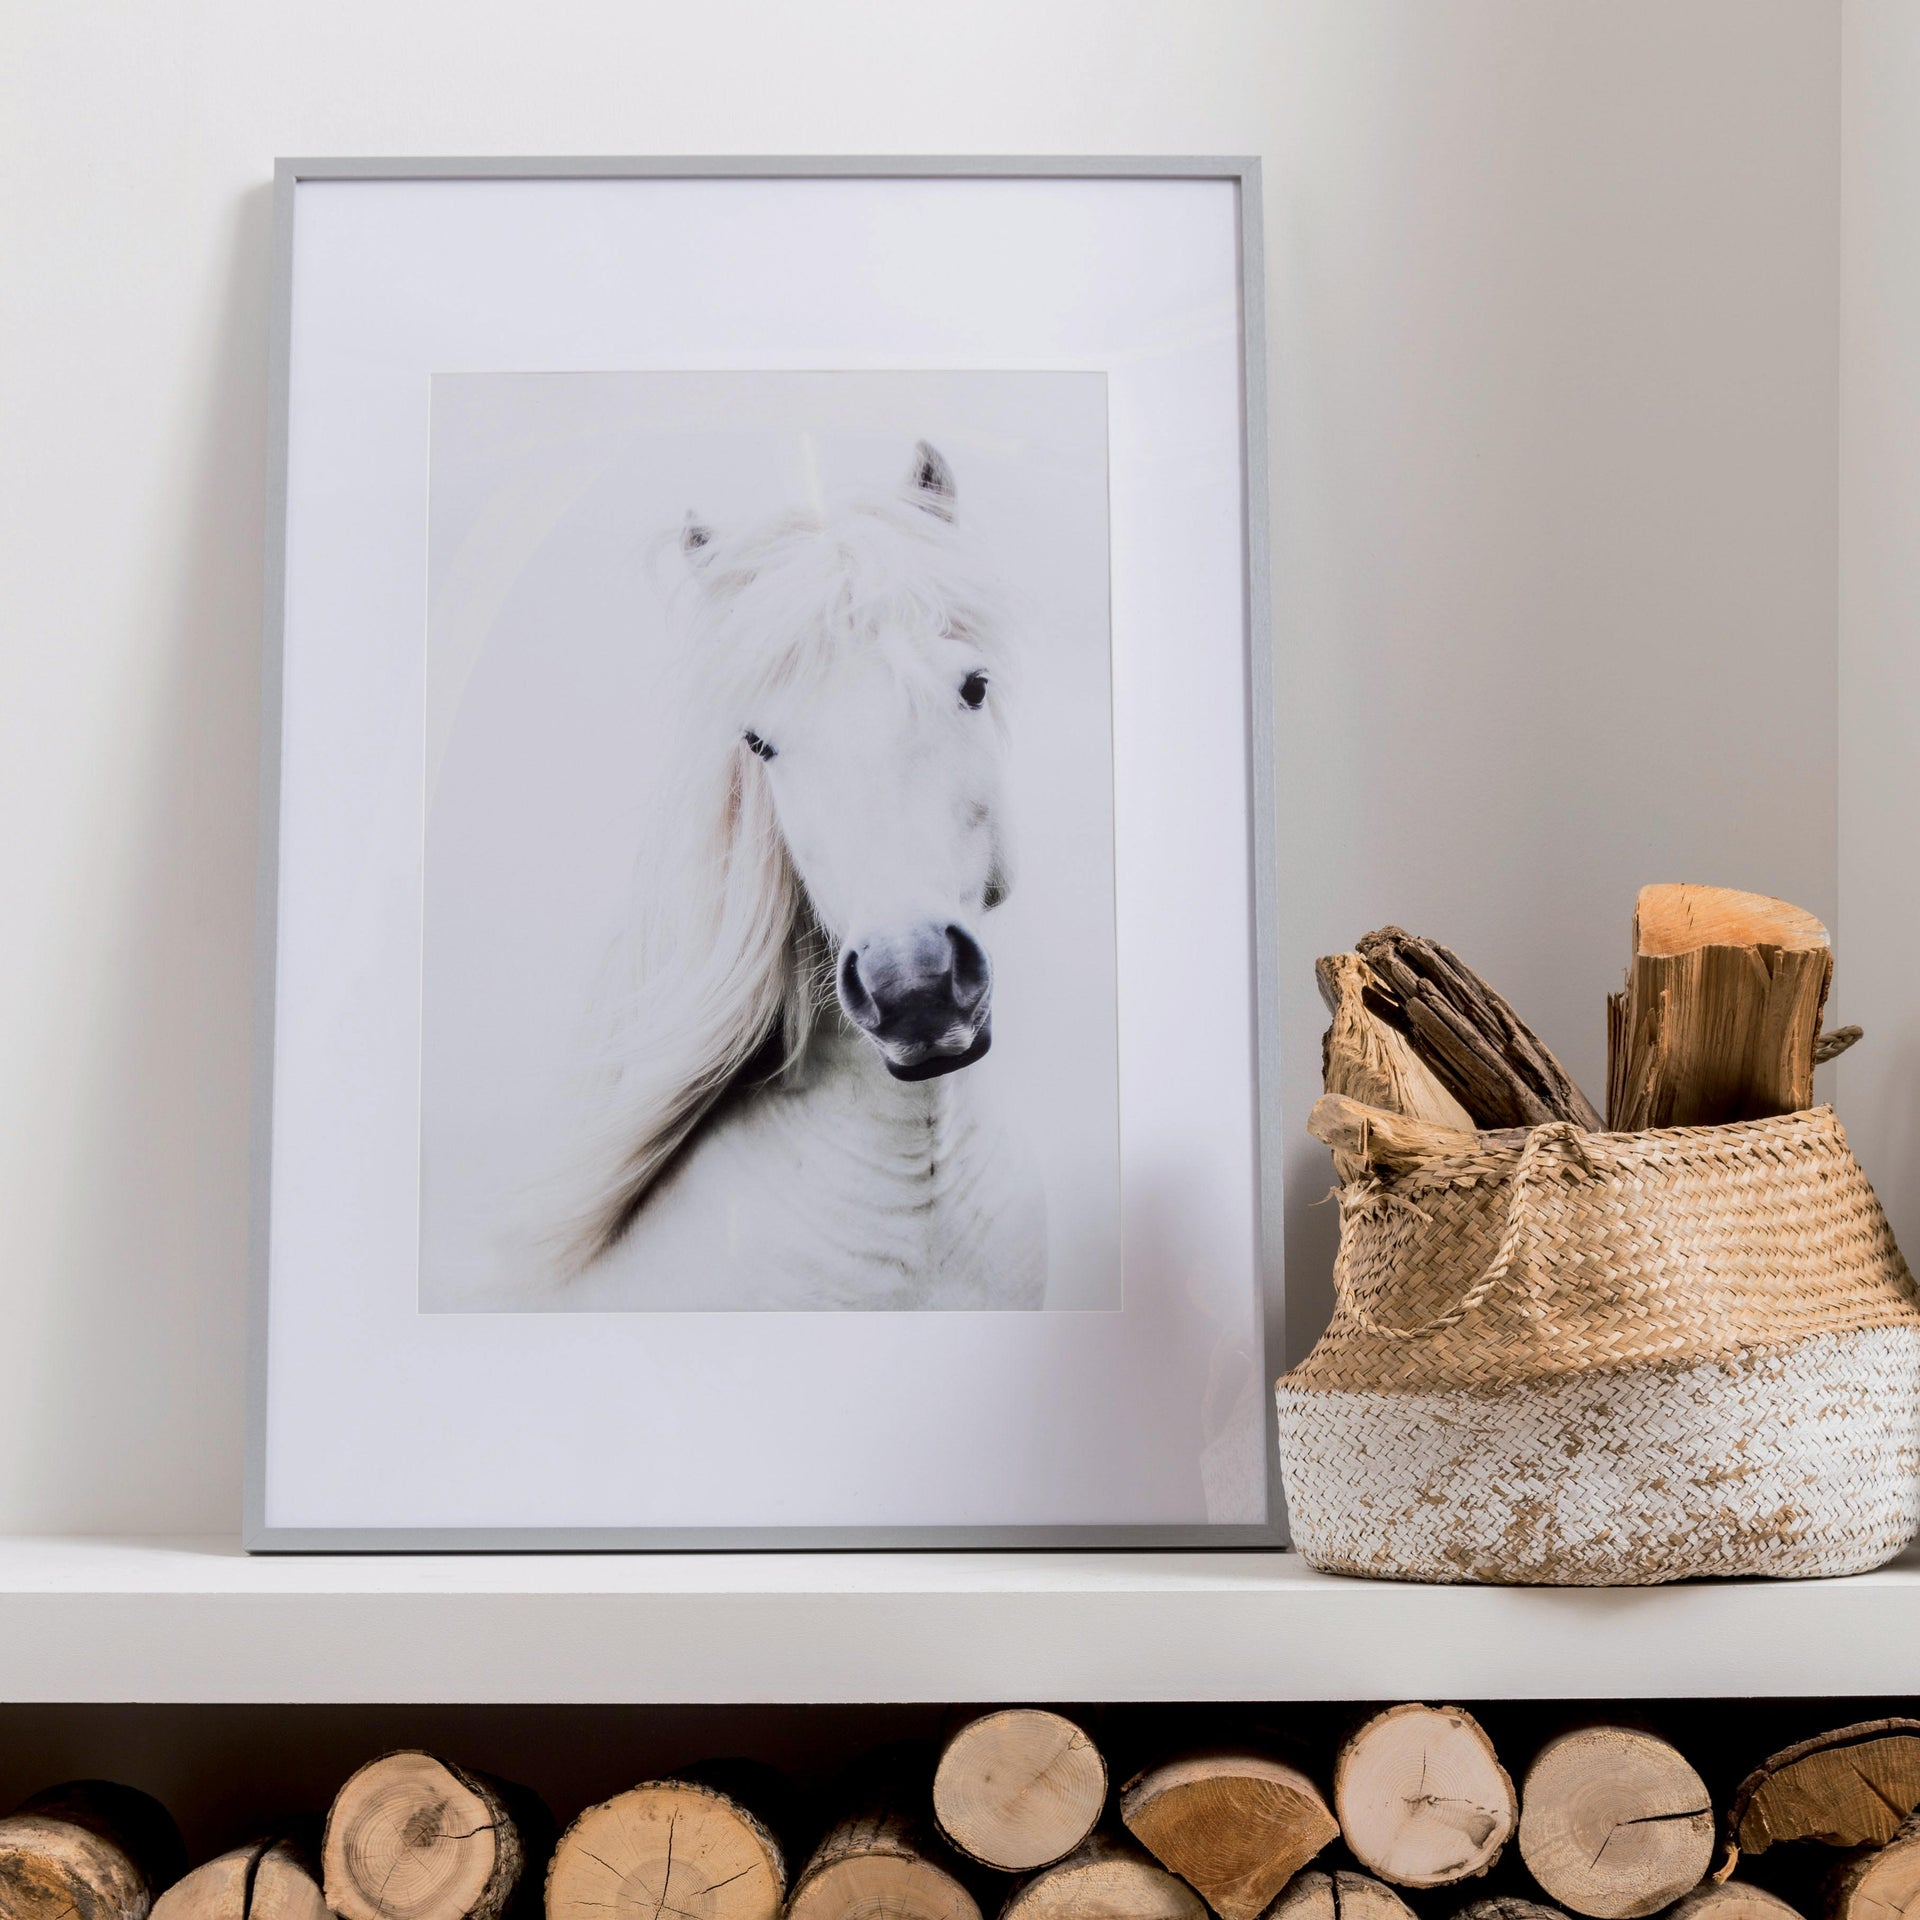 Cornice con passe-partout Inspire milo argento 40x50 cm - 2